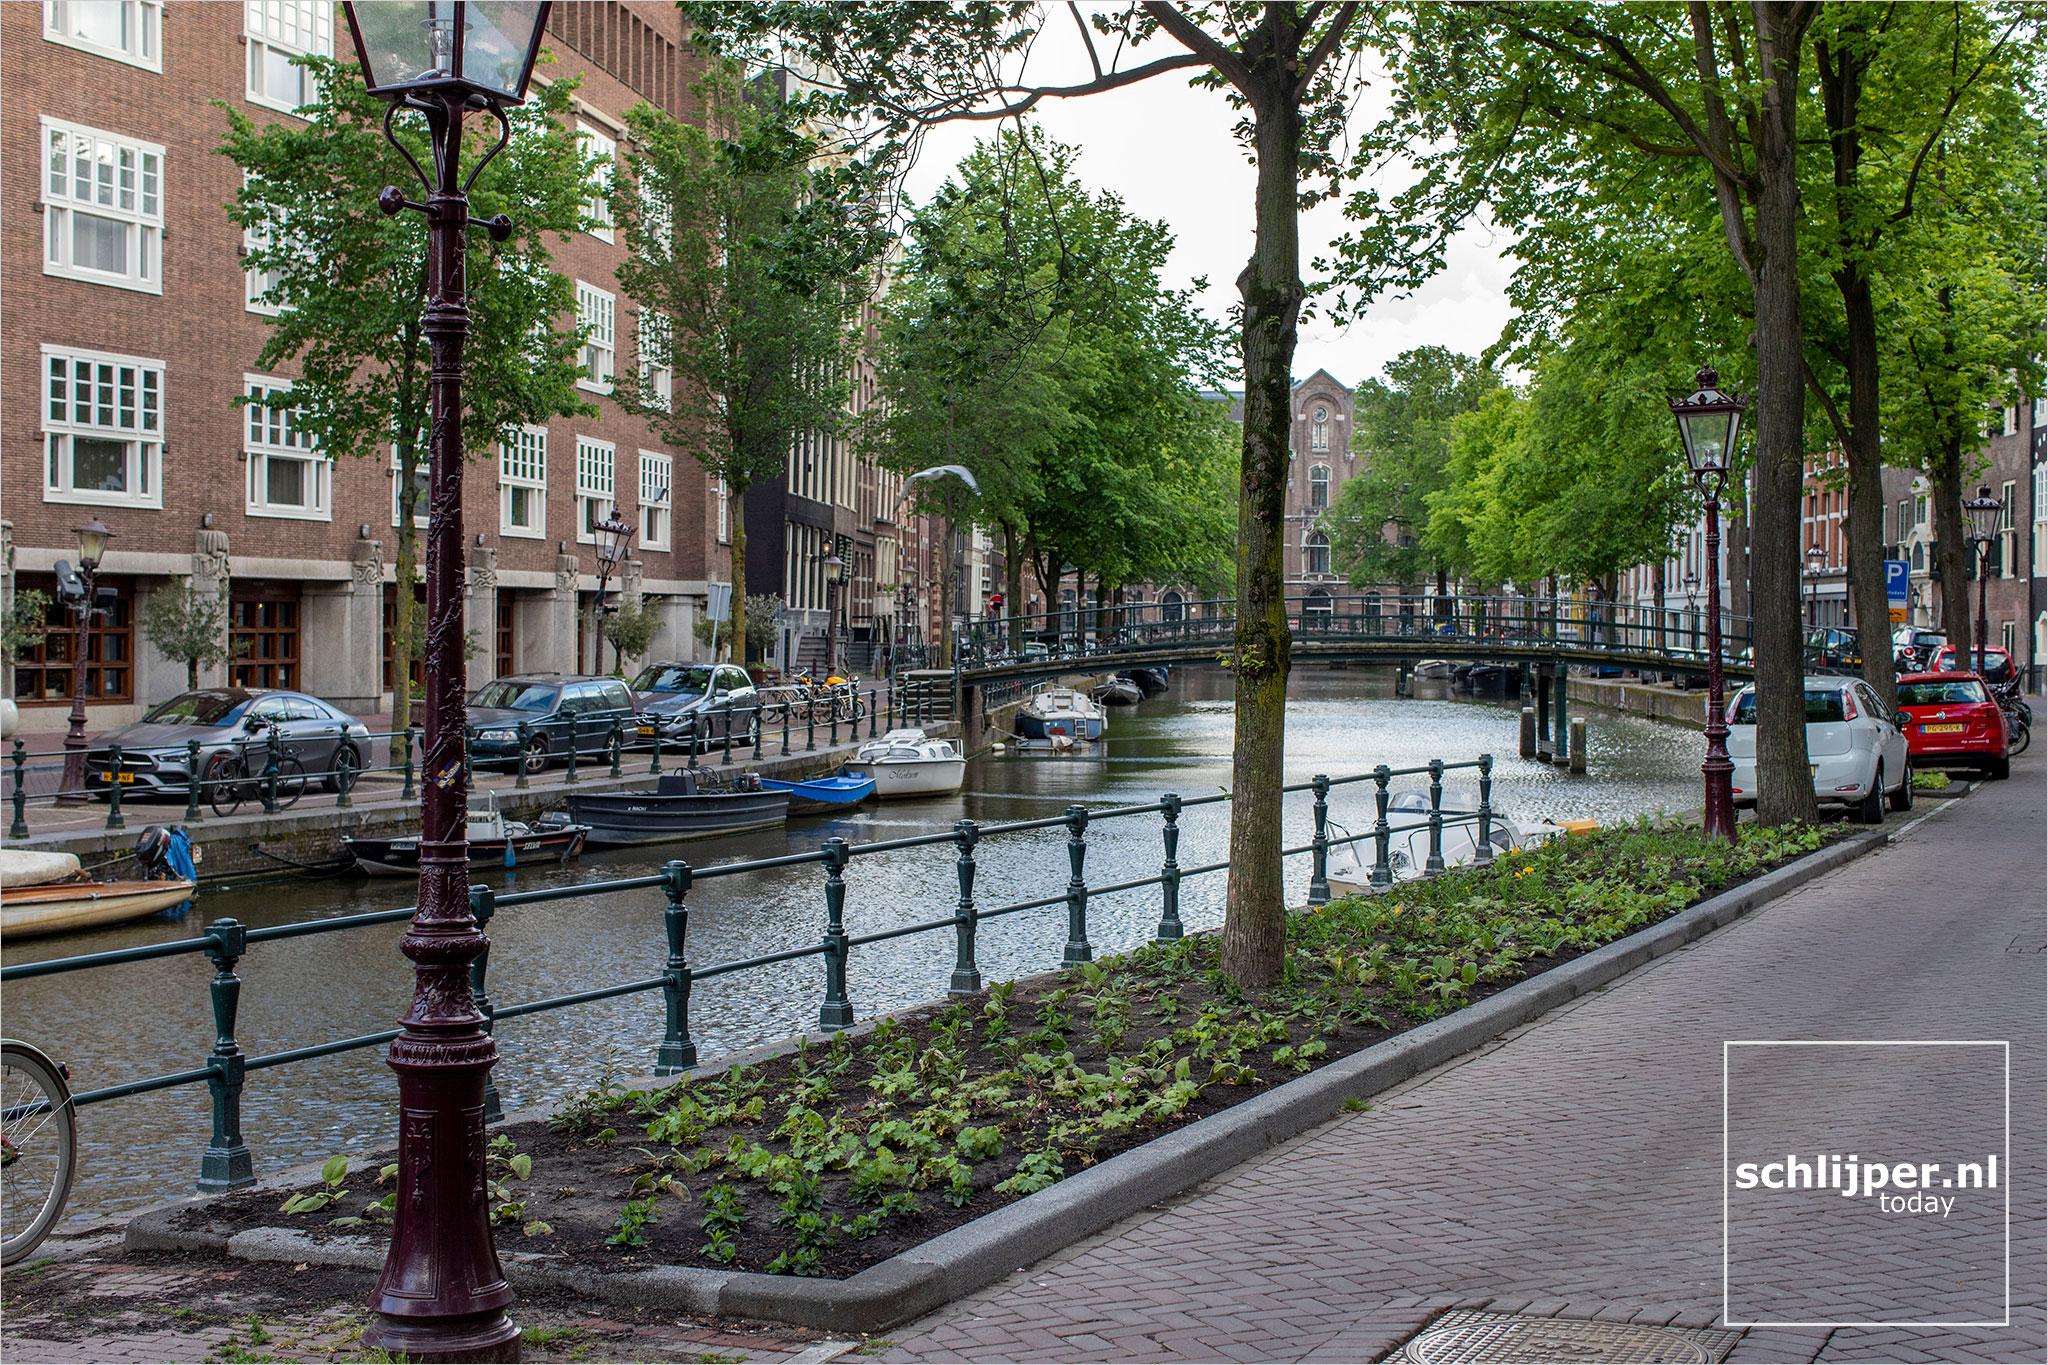 Nederland, Amsterdam, 5 juni 2020